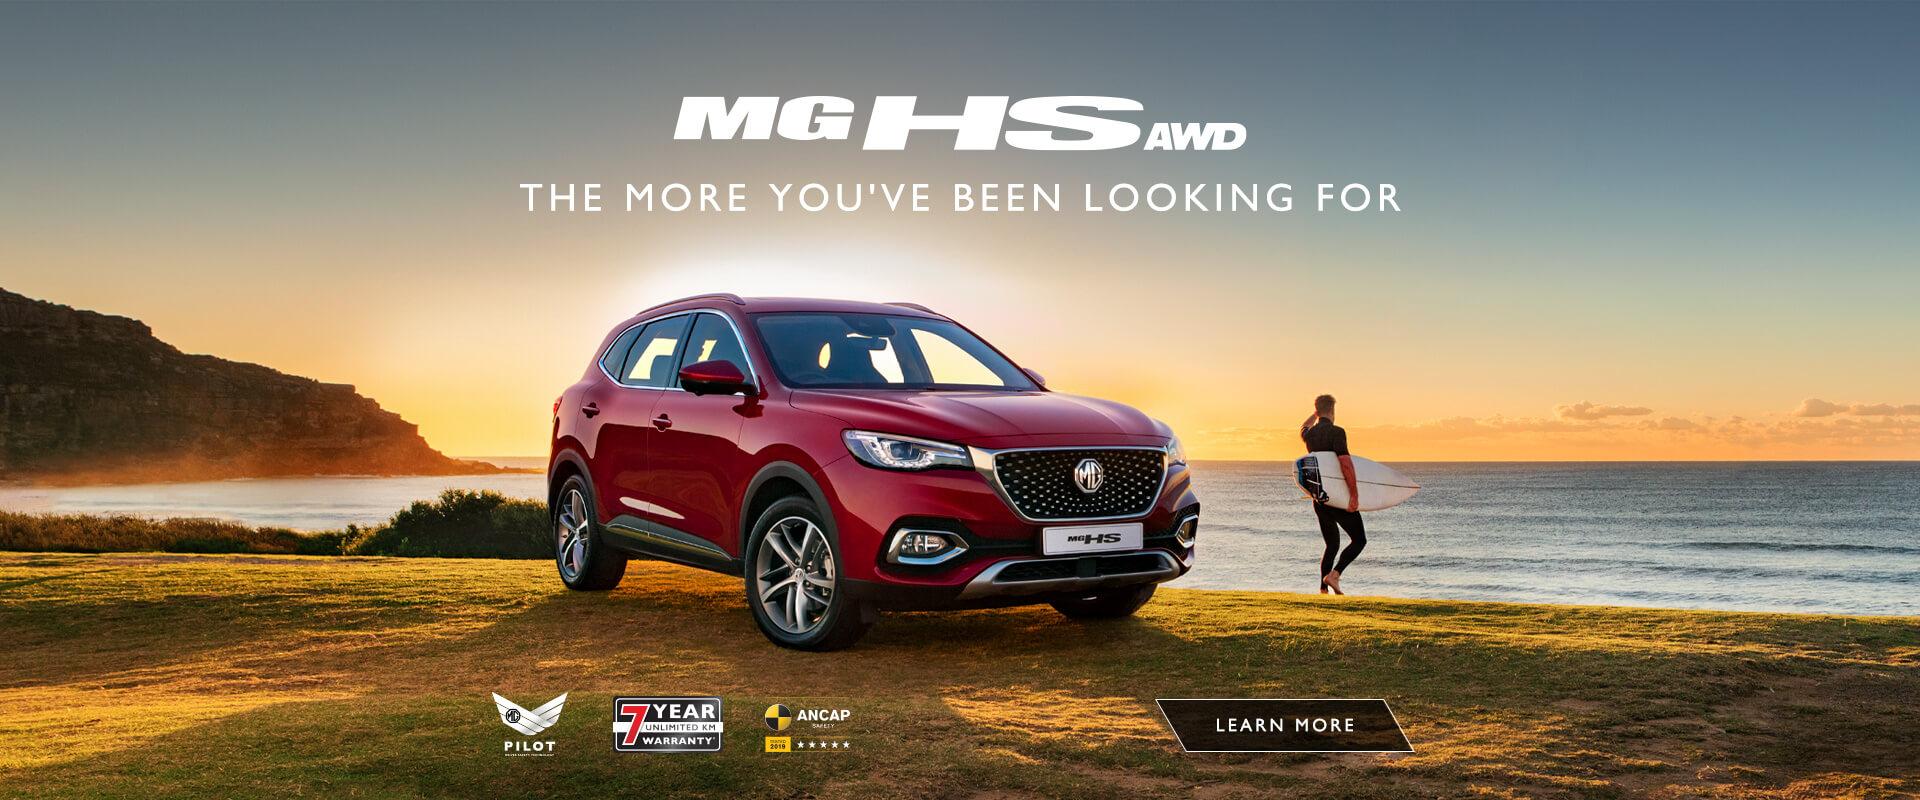 MG HS AWD